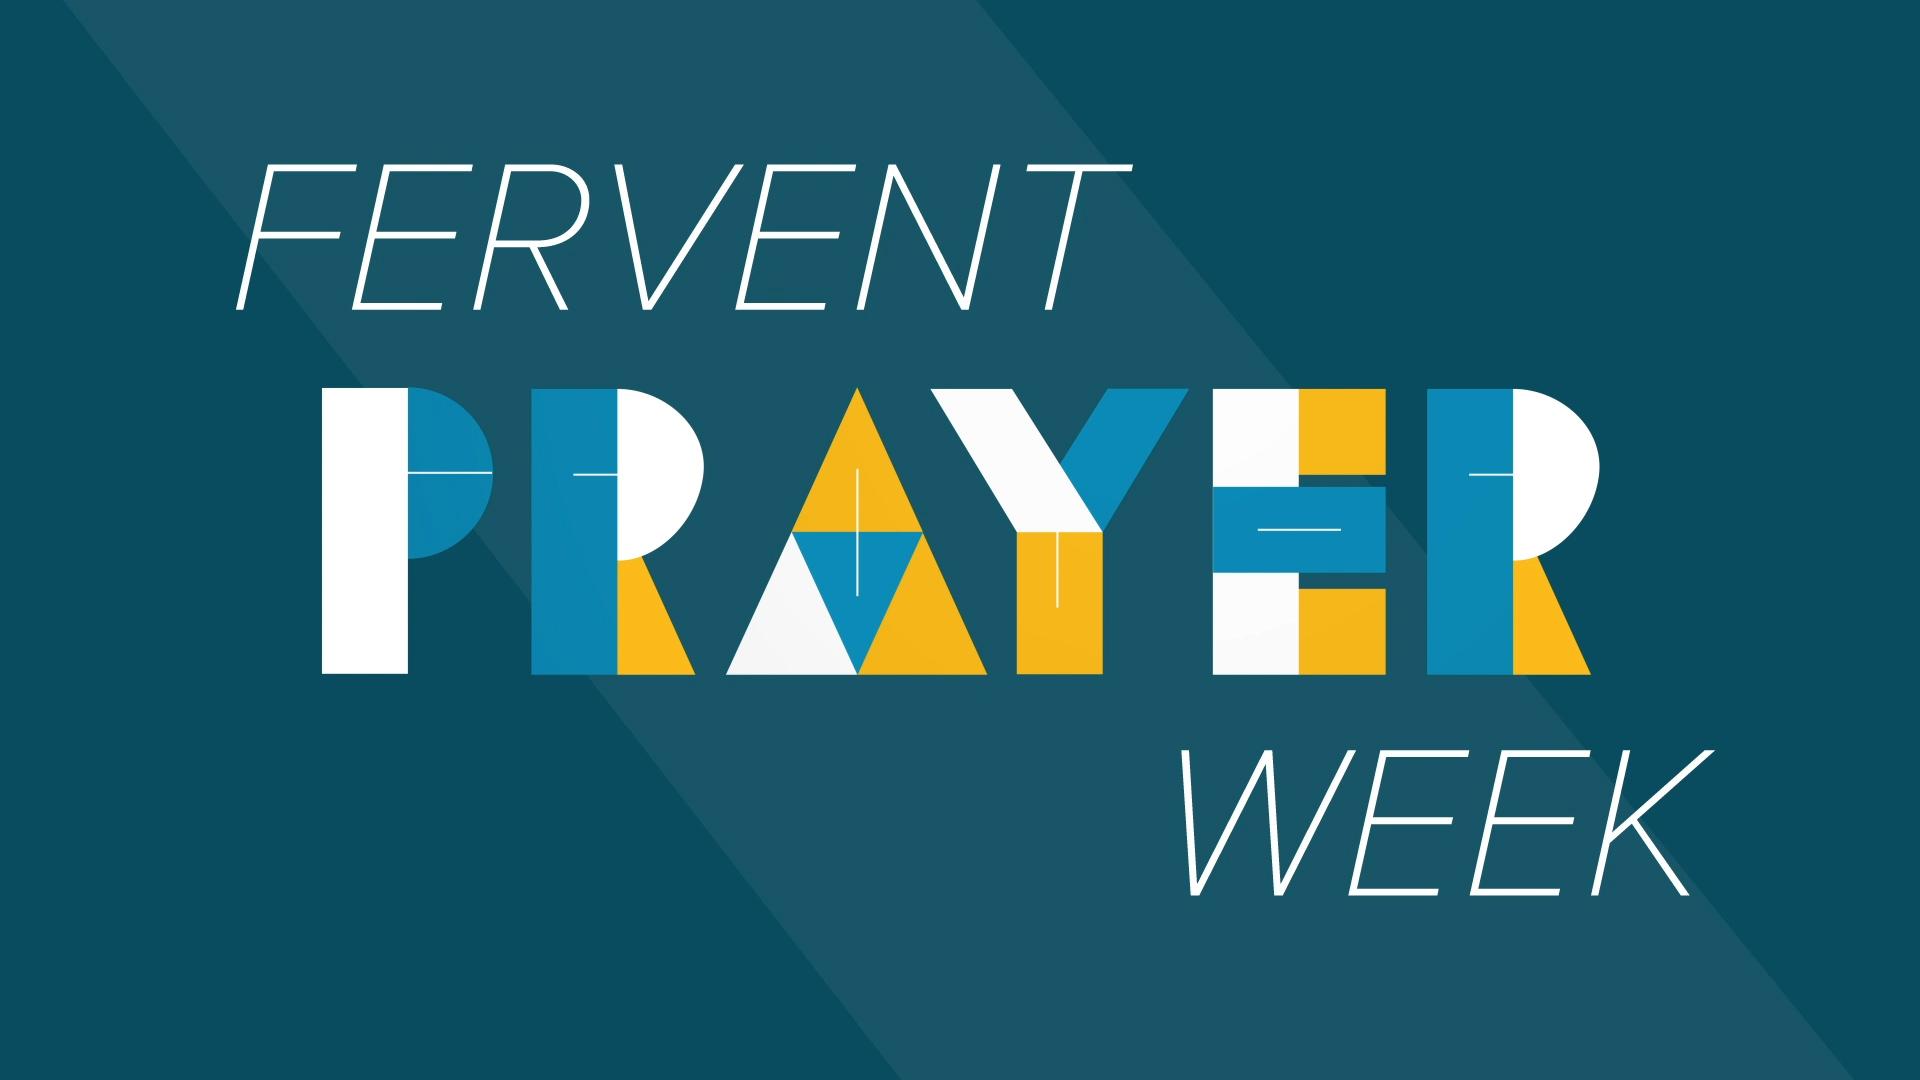 fervent prayer week